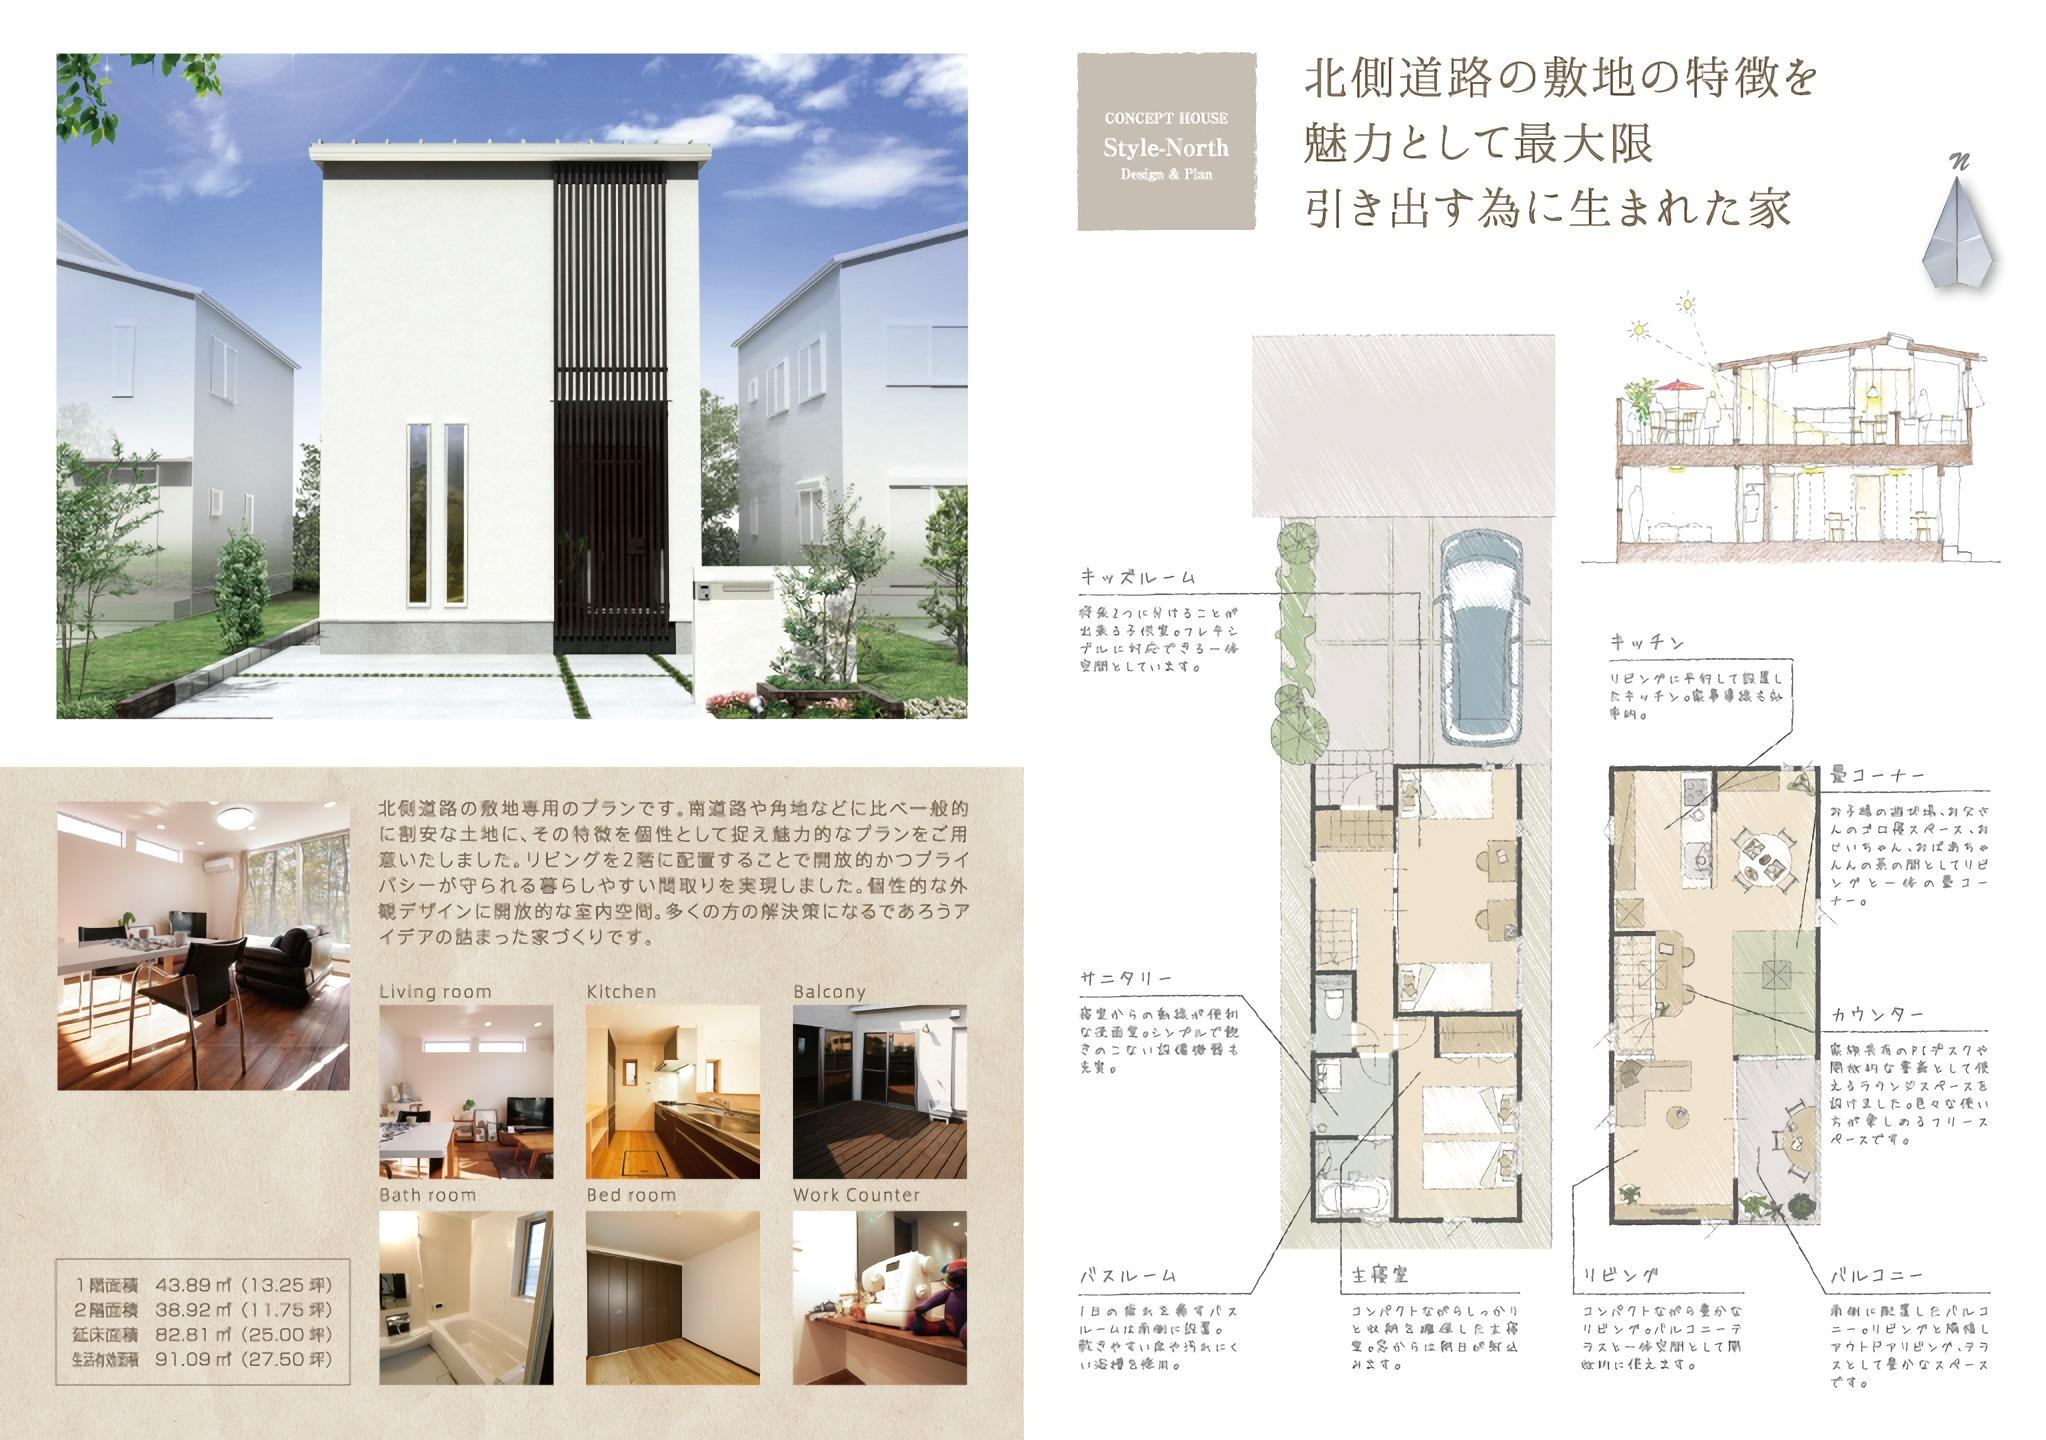 style-north.jpg